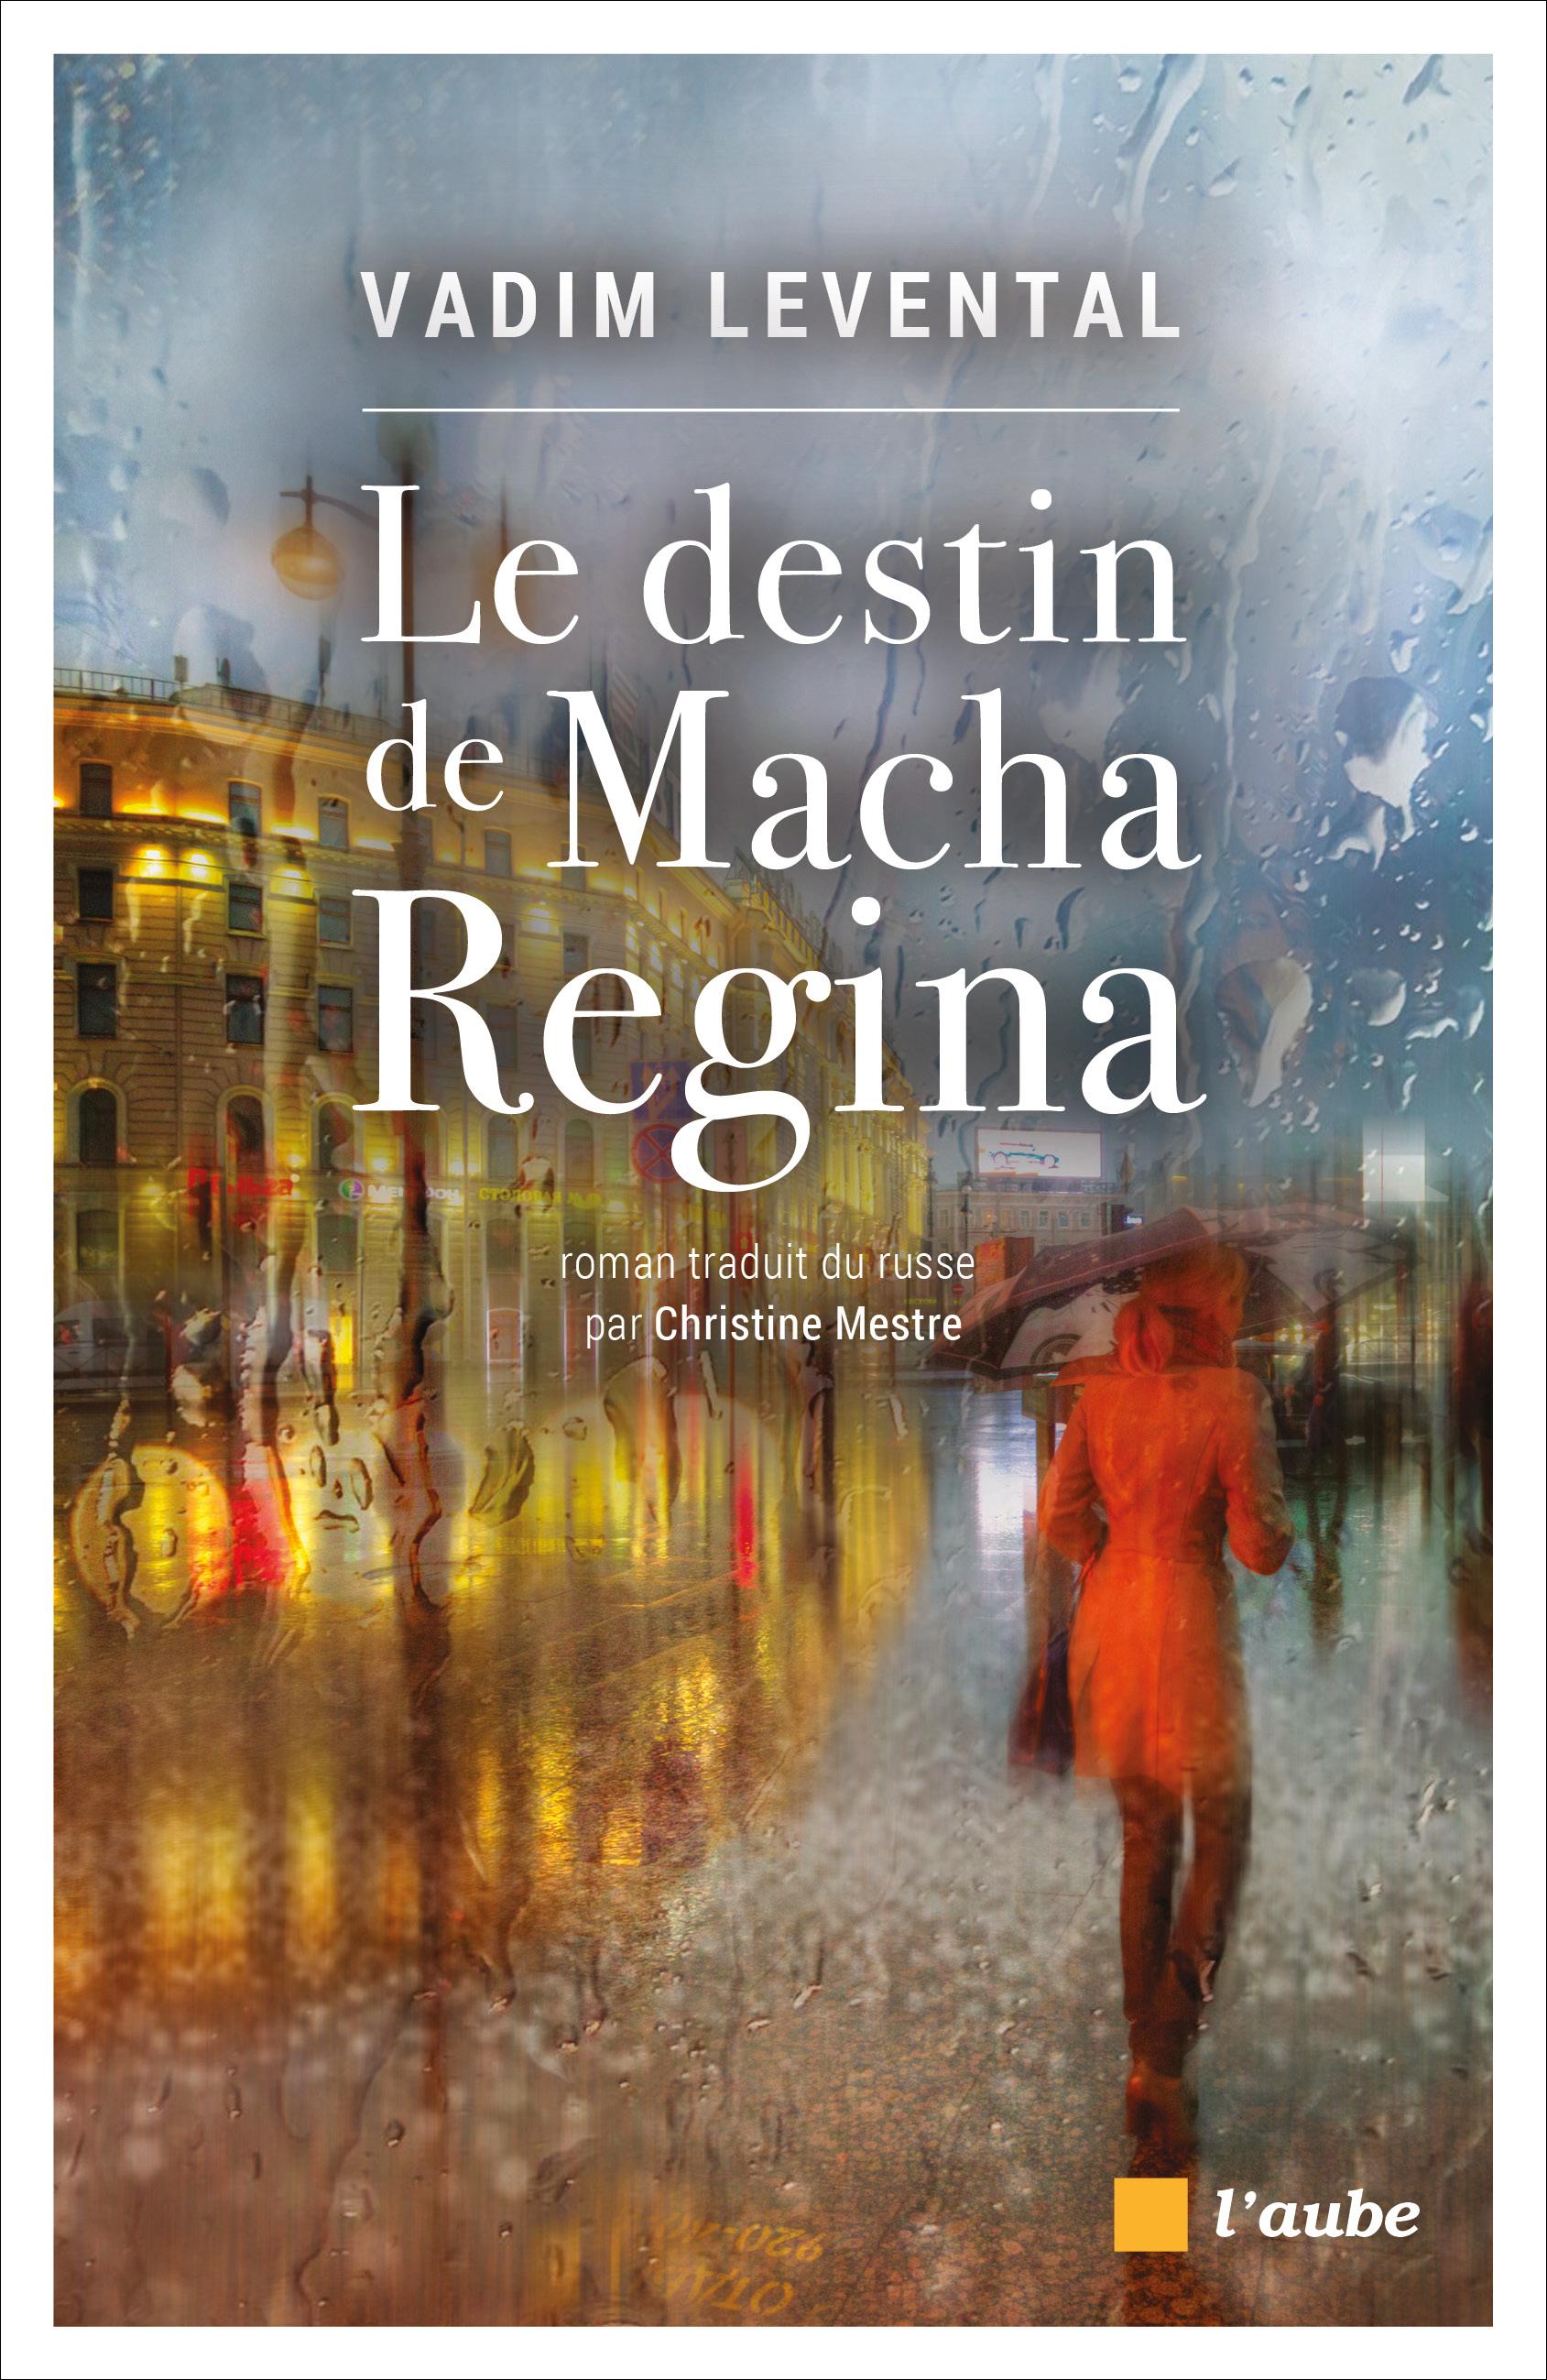 Le destin de Macha Régina | LEVENTAL, Vadim